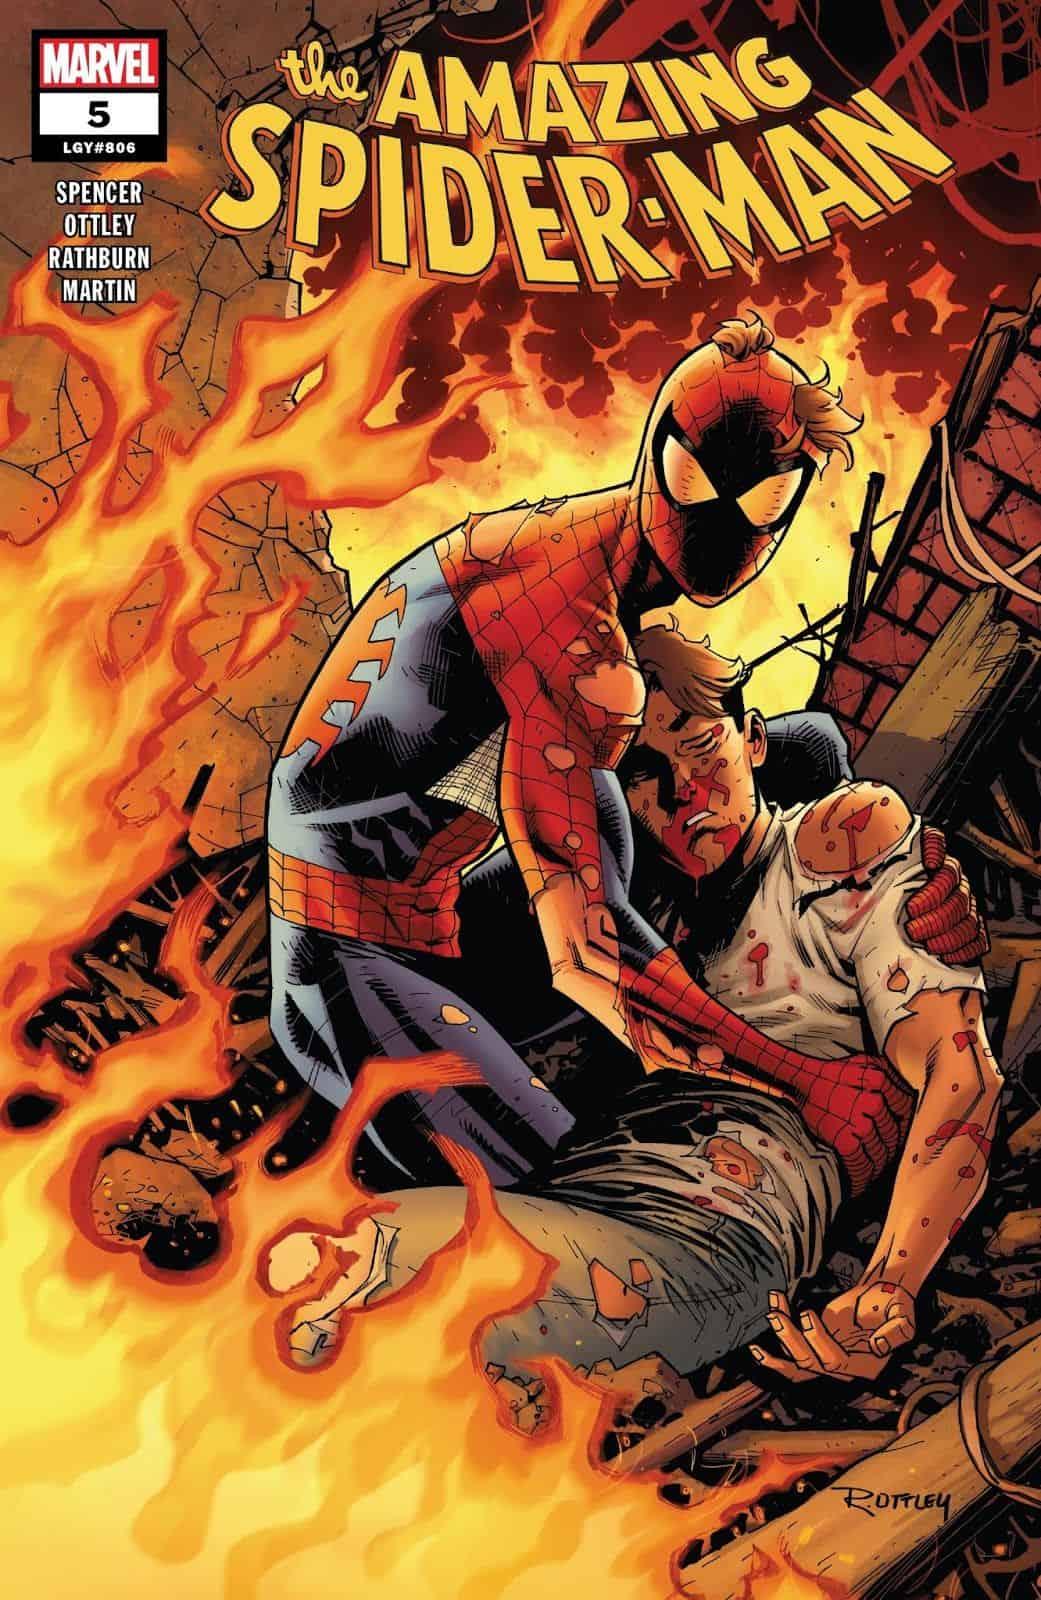 Marvel Comics Universe Amp Amazing Spider Man 5 Spoilers